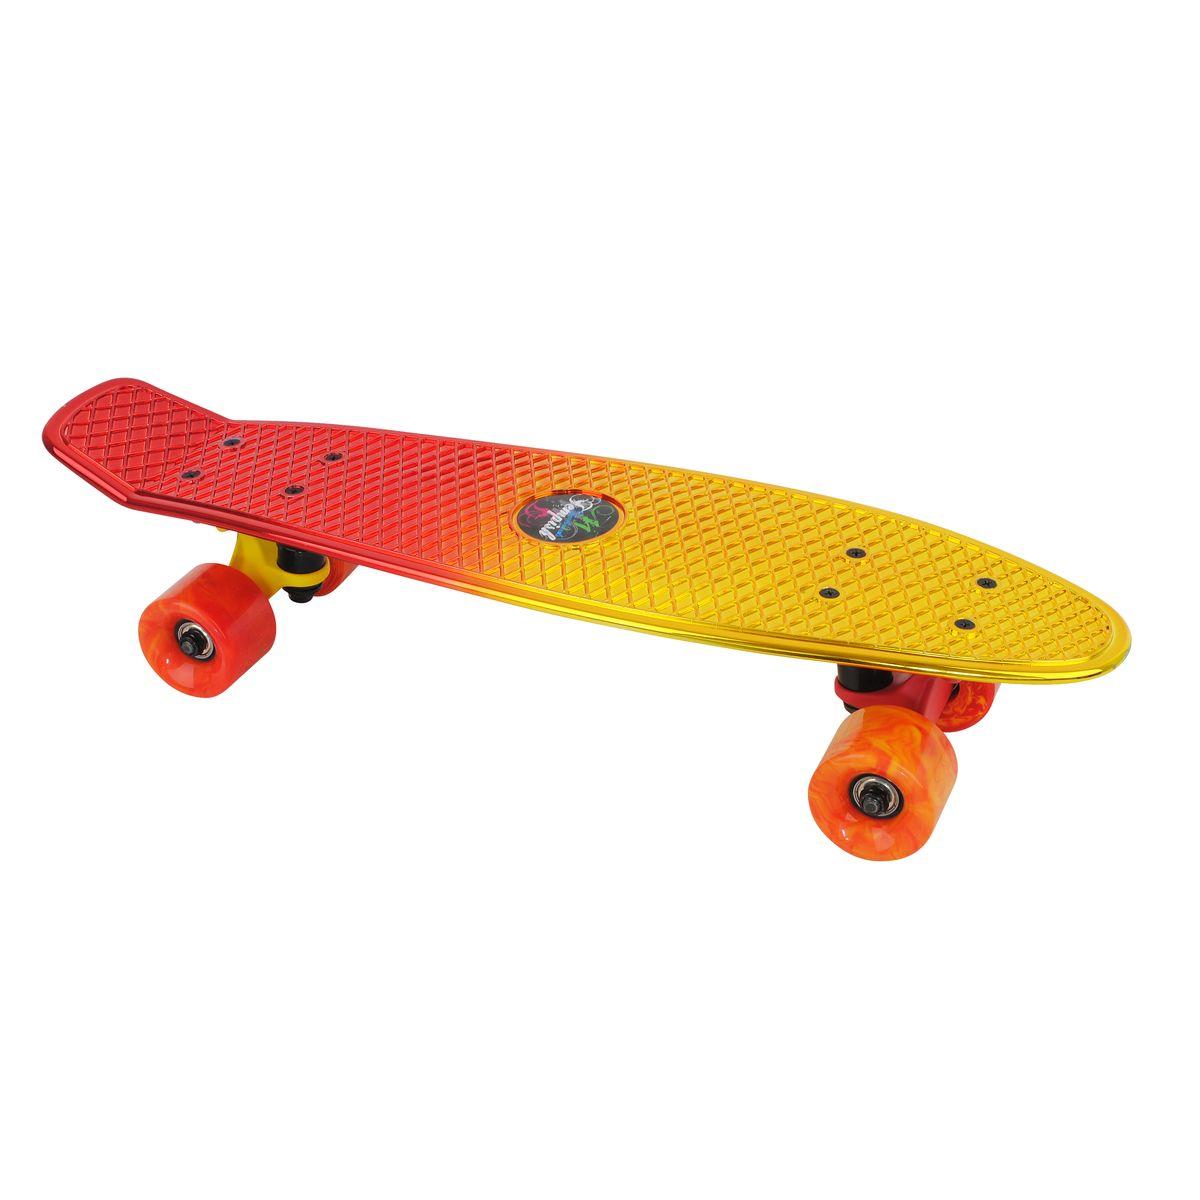 Скейтборд пластиковый Tempish Retro Buffy Star, цвет: золотистыйMHDR2G/AПени борд Tempish Buffy нагрузка до 100 кг